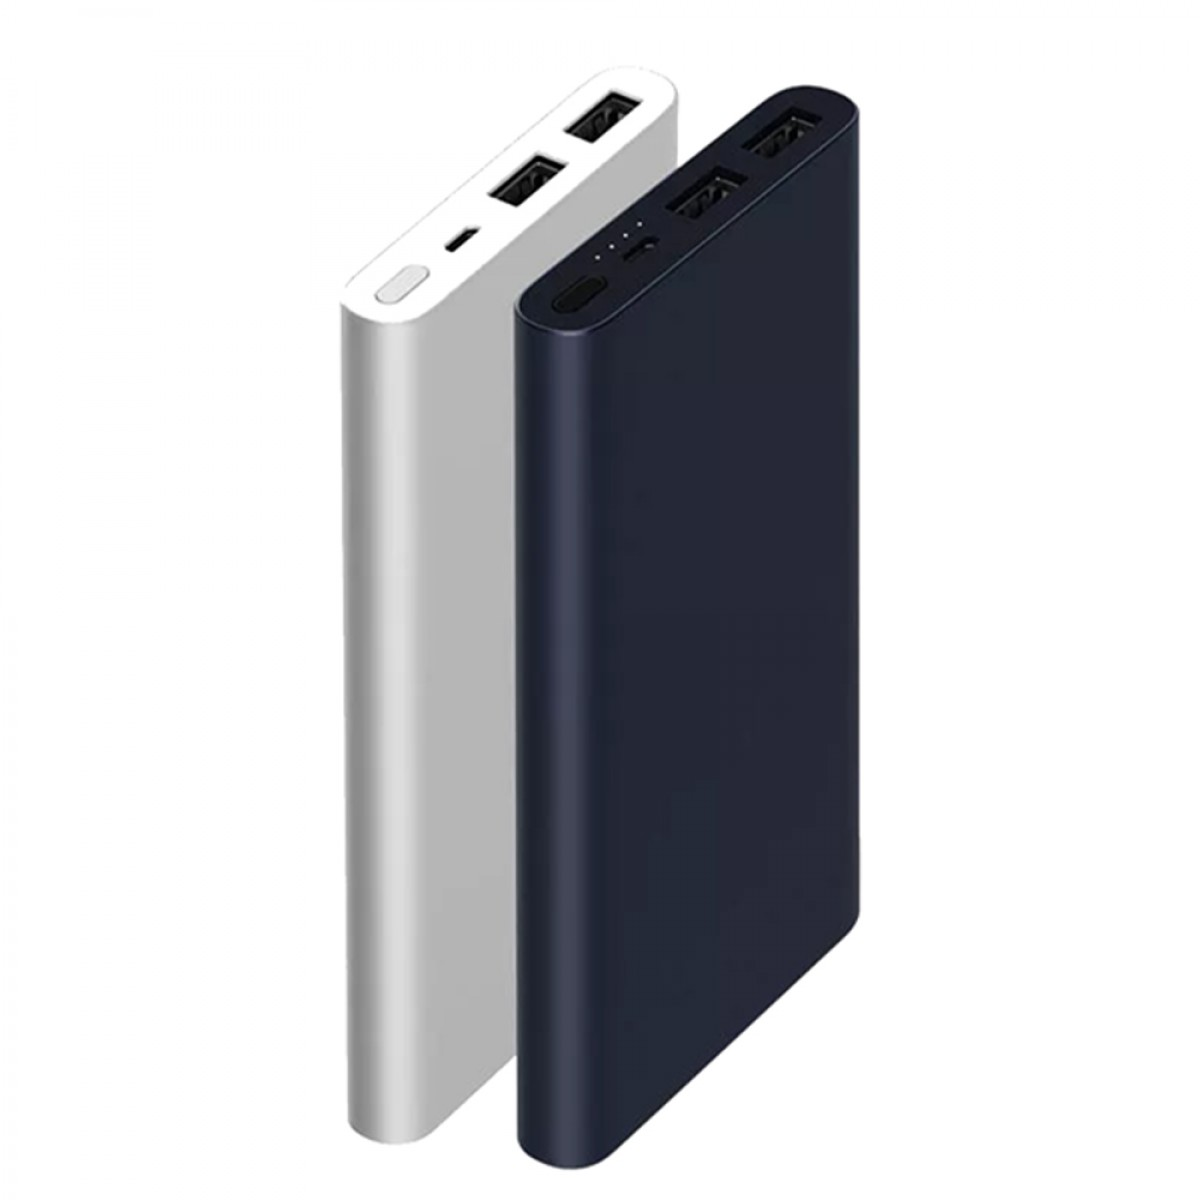 Xiaomi 10000mAh Mi 18W Fast Charge Power Bank 3 - VEVE